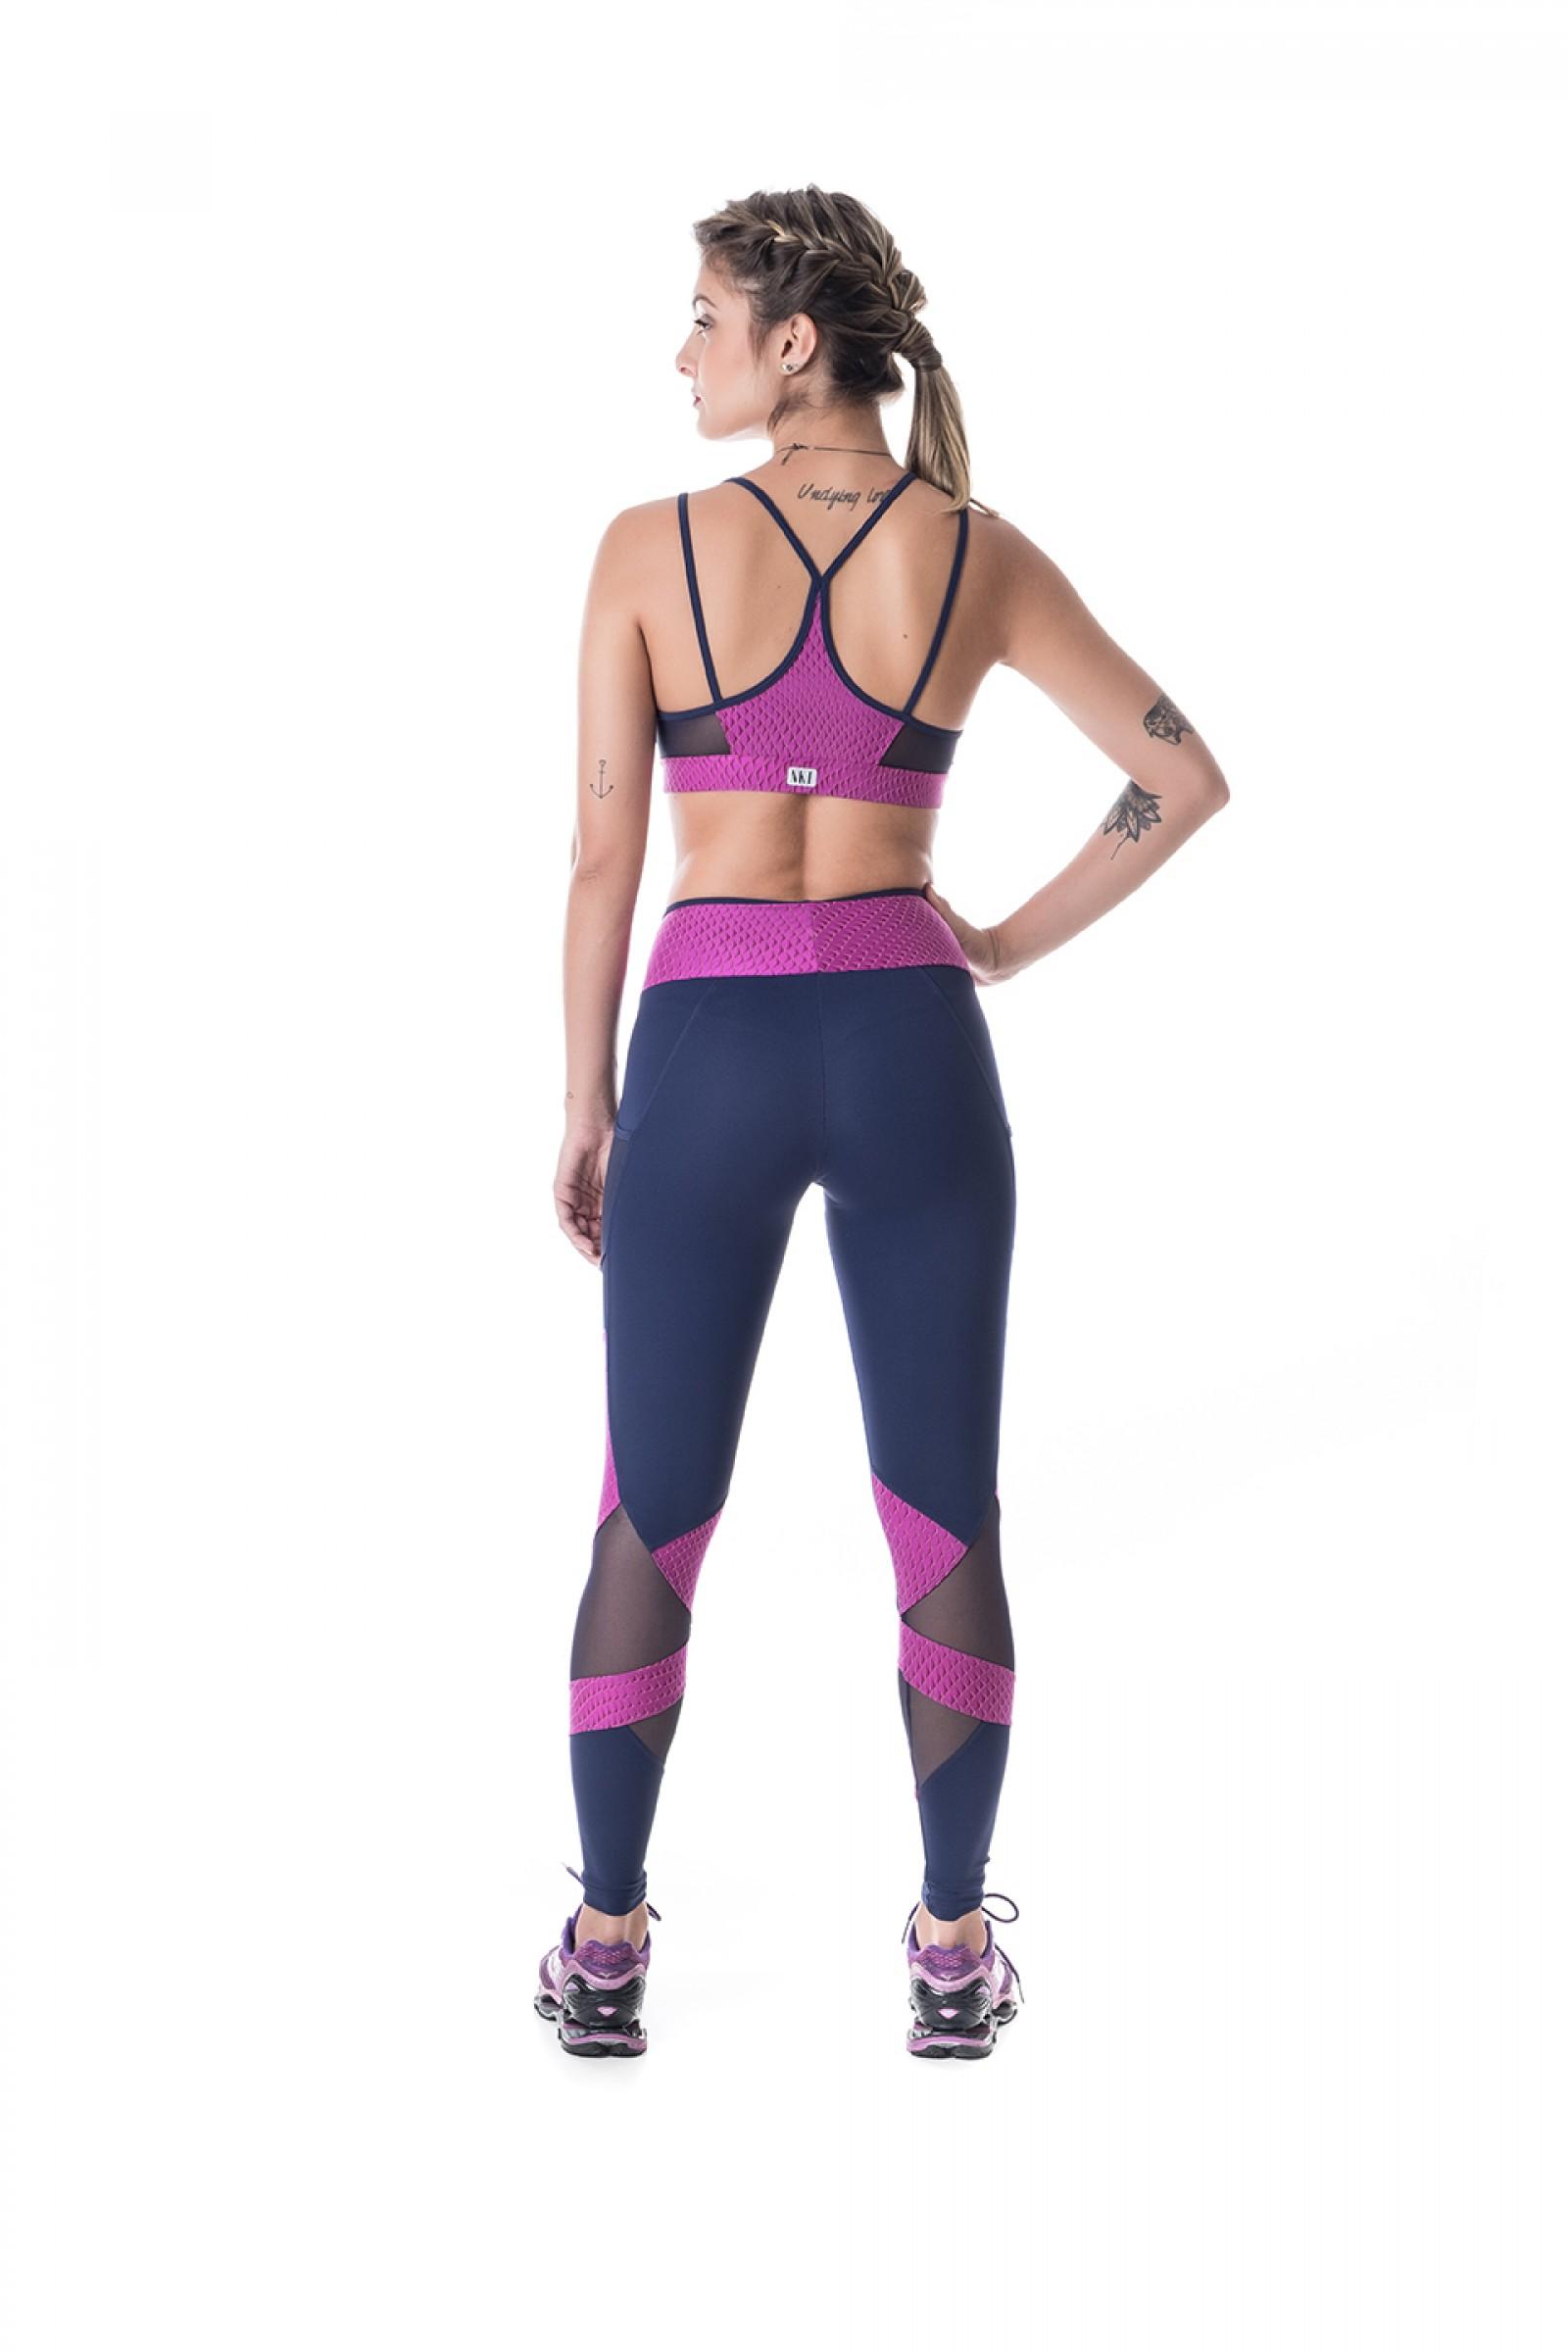 Top Best Roxo, Coleção Challenge - NKT Fitwear Moda Fitness